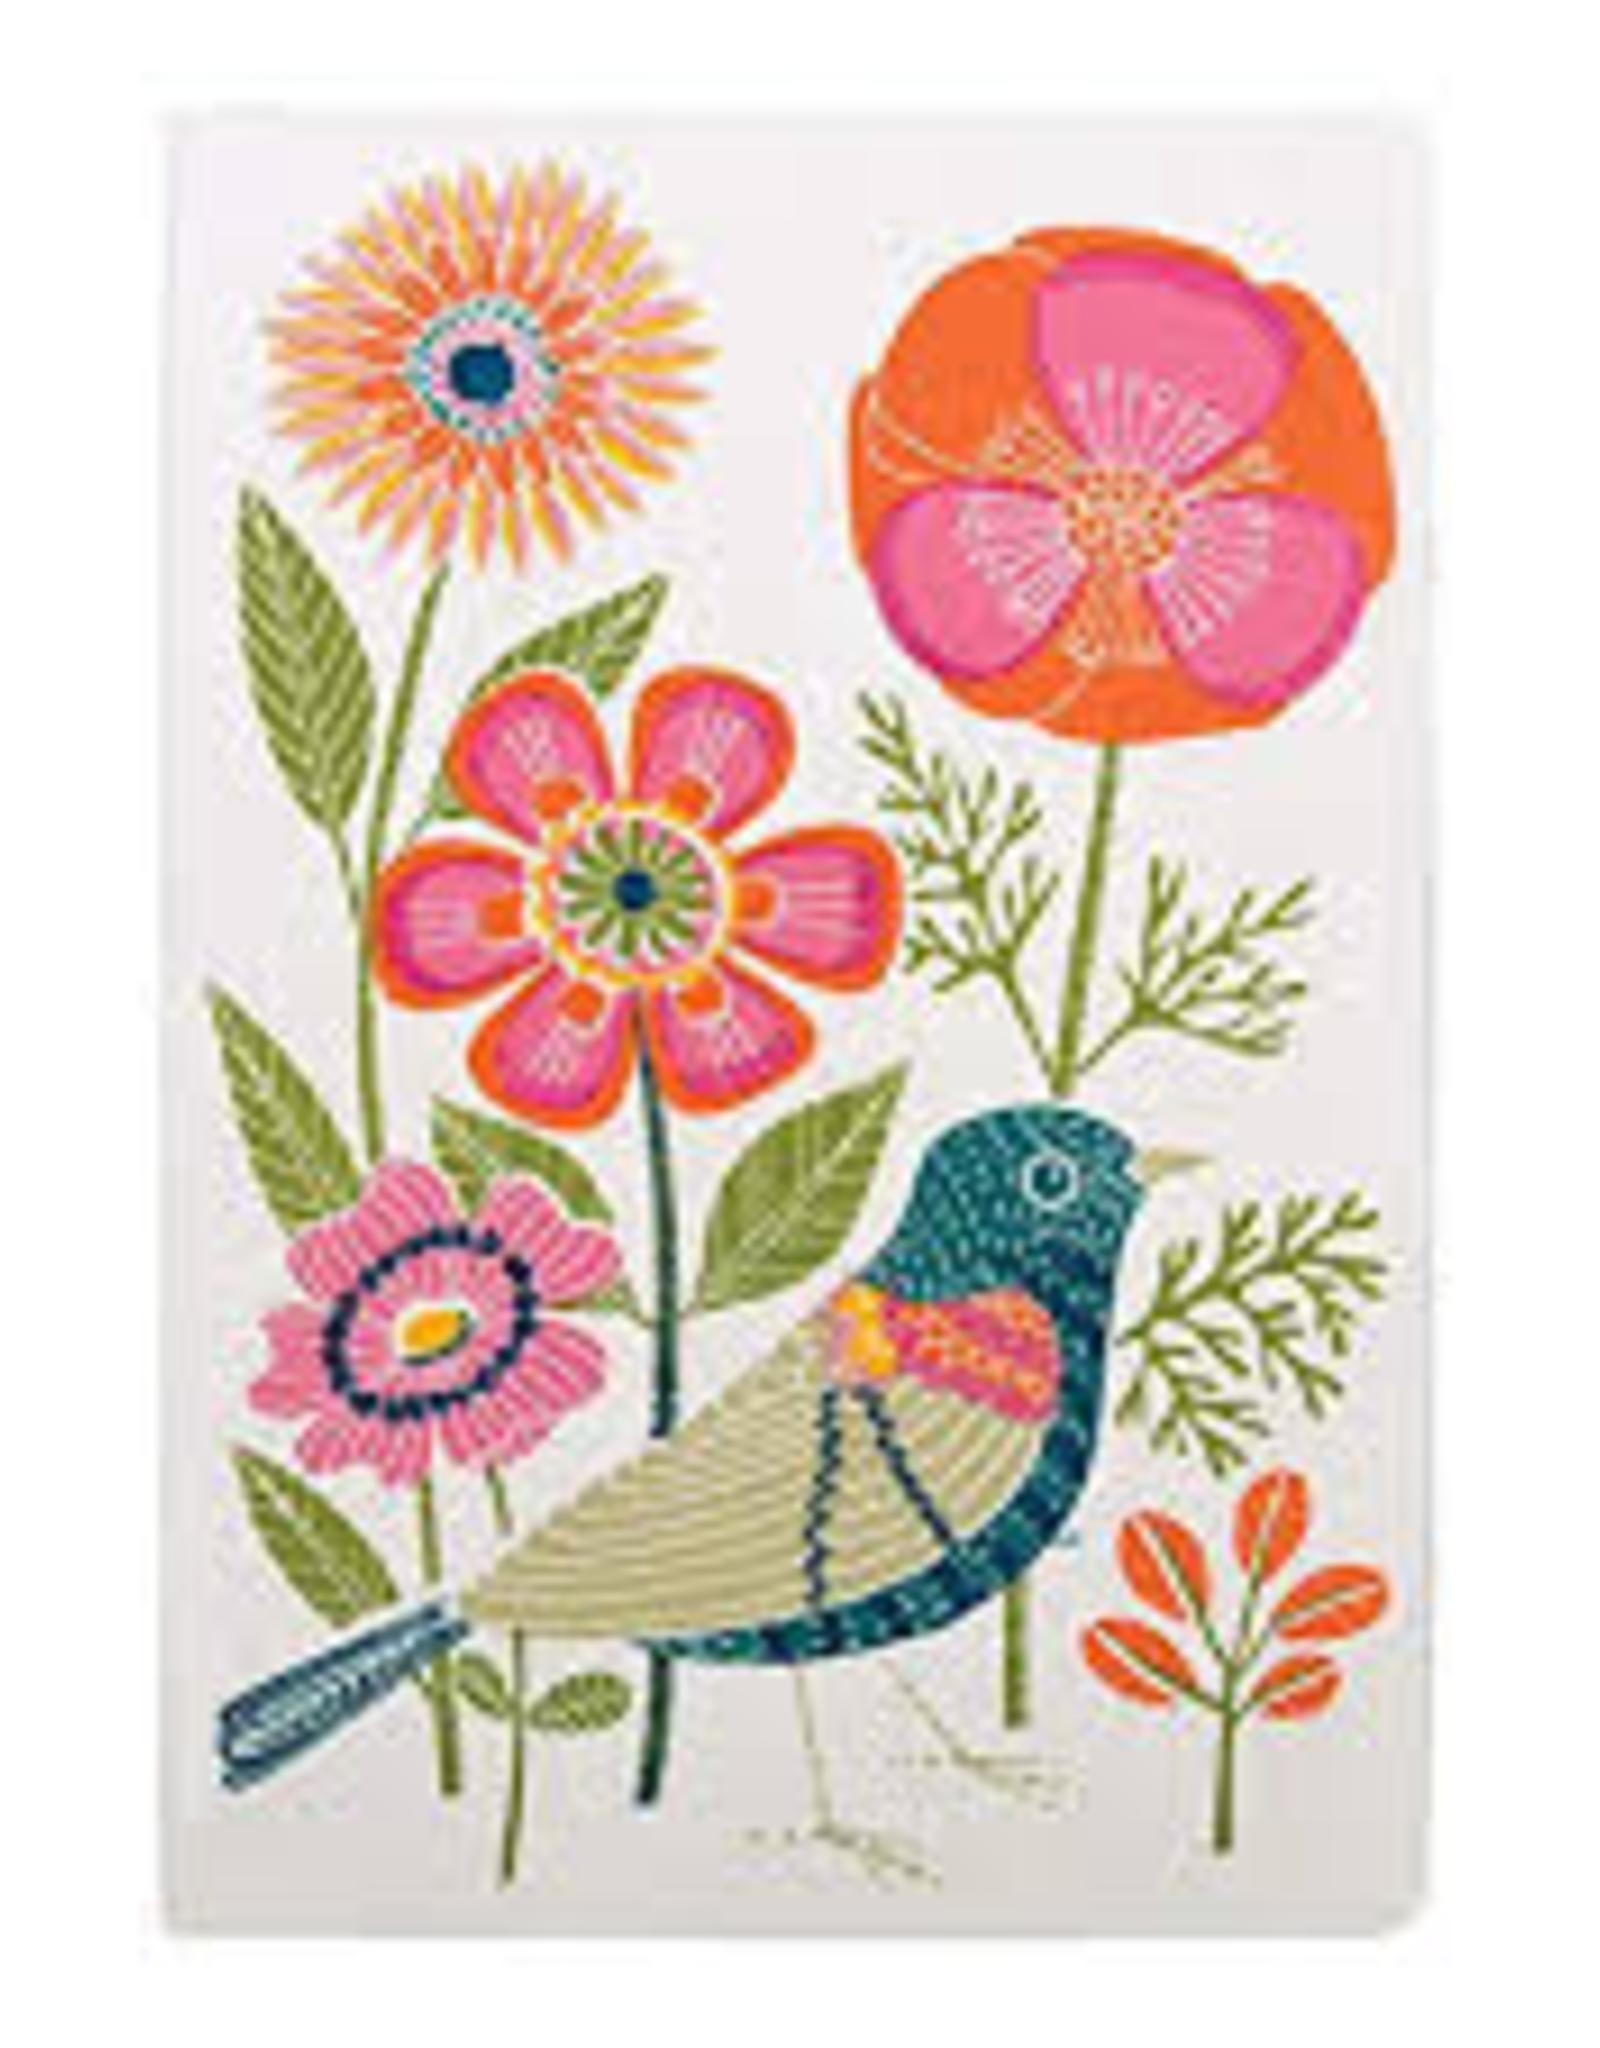 Avian Friends Embroidered Journal